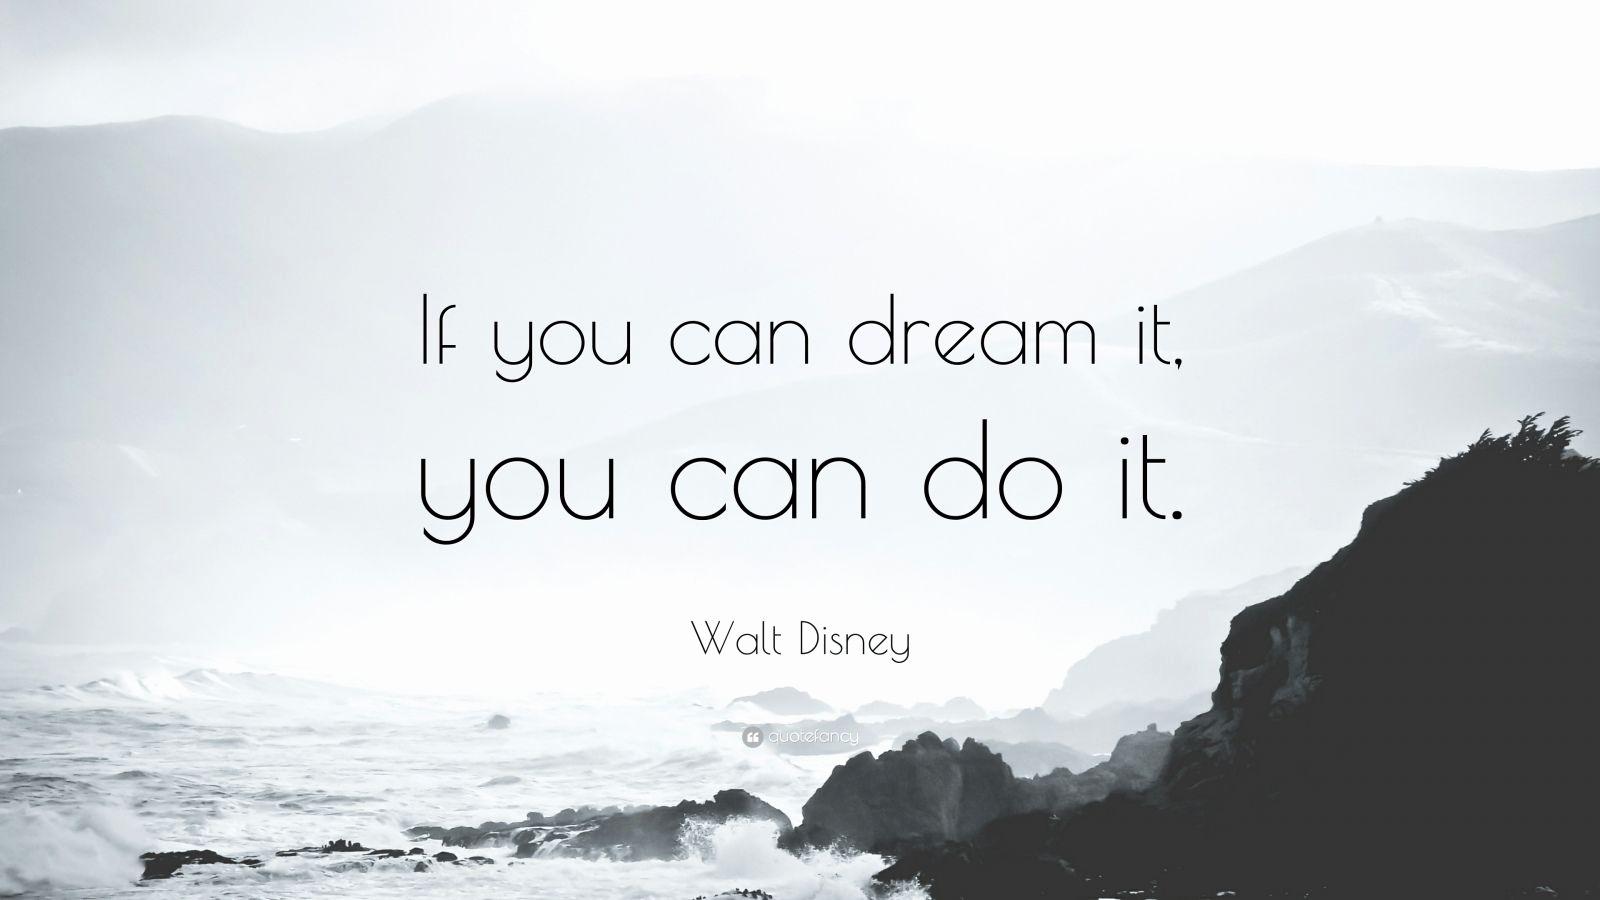 Disney Quotes Wallpaper 1600x900 Download Hd Wallpaper Wallpapertip